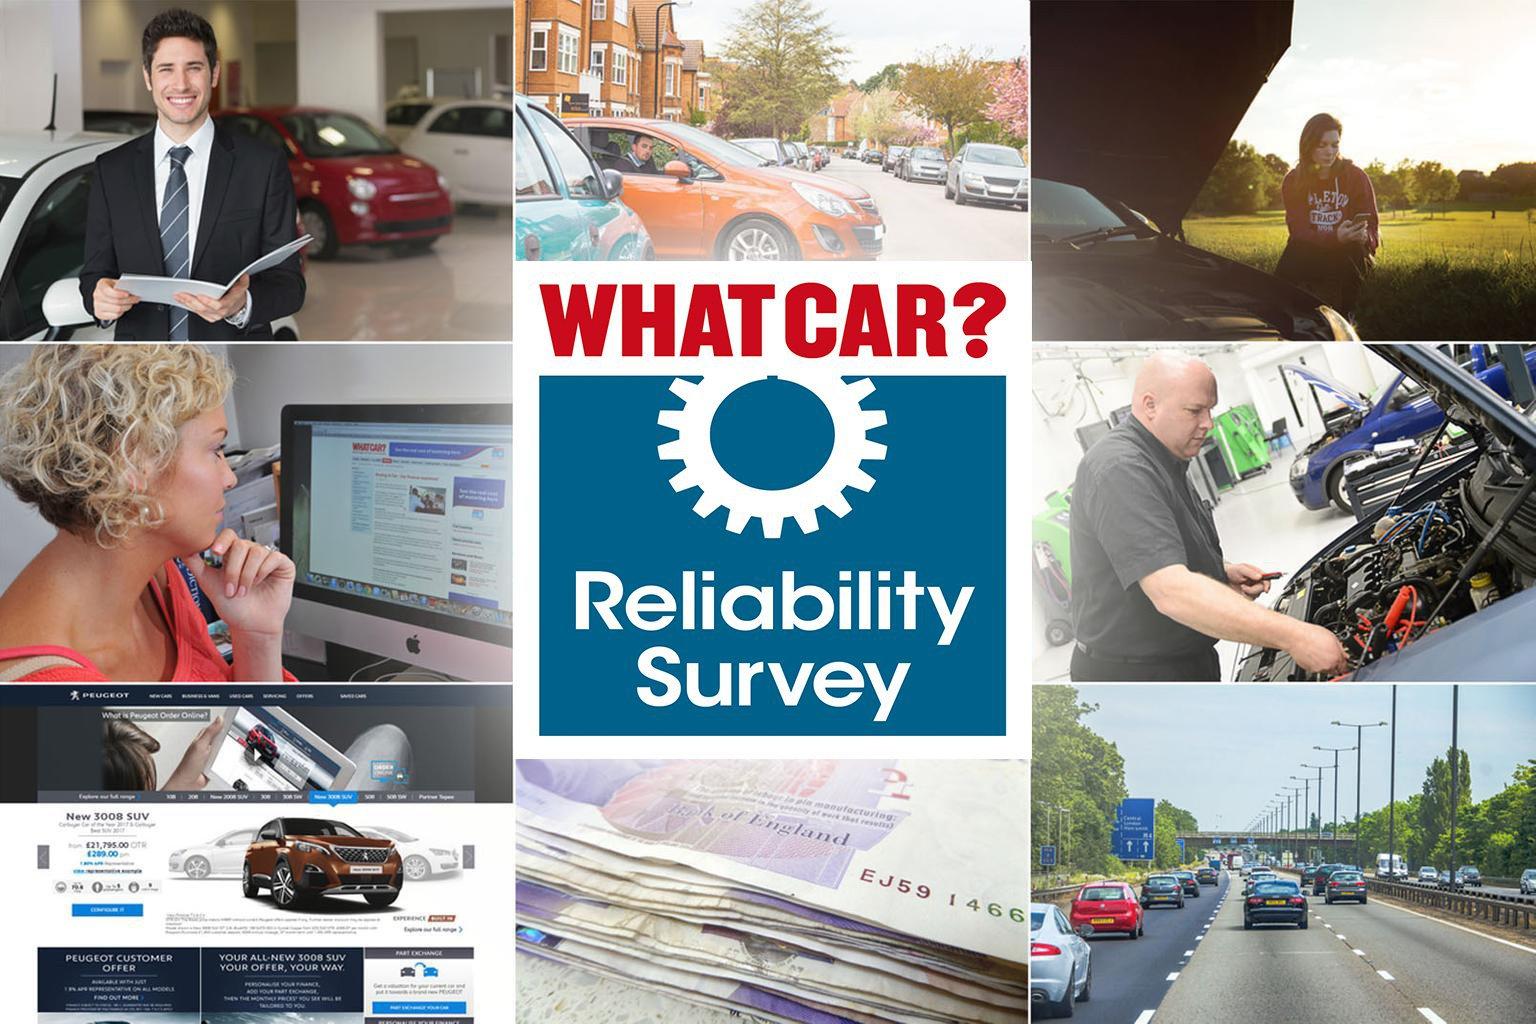 Reliability survey compilation image